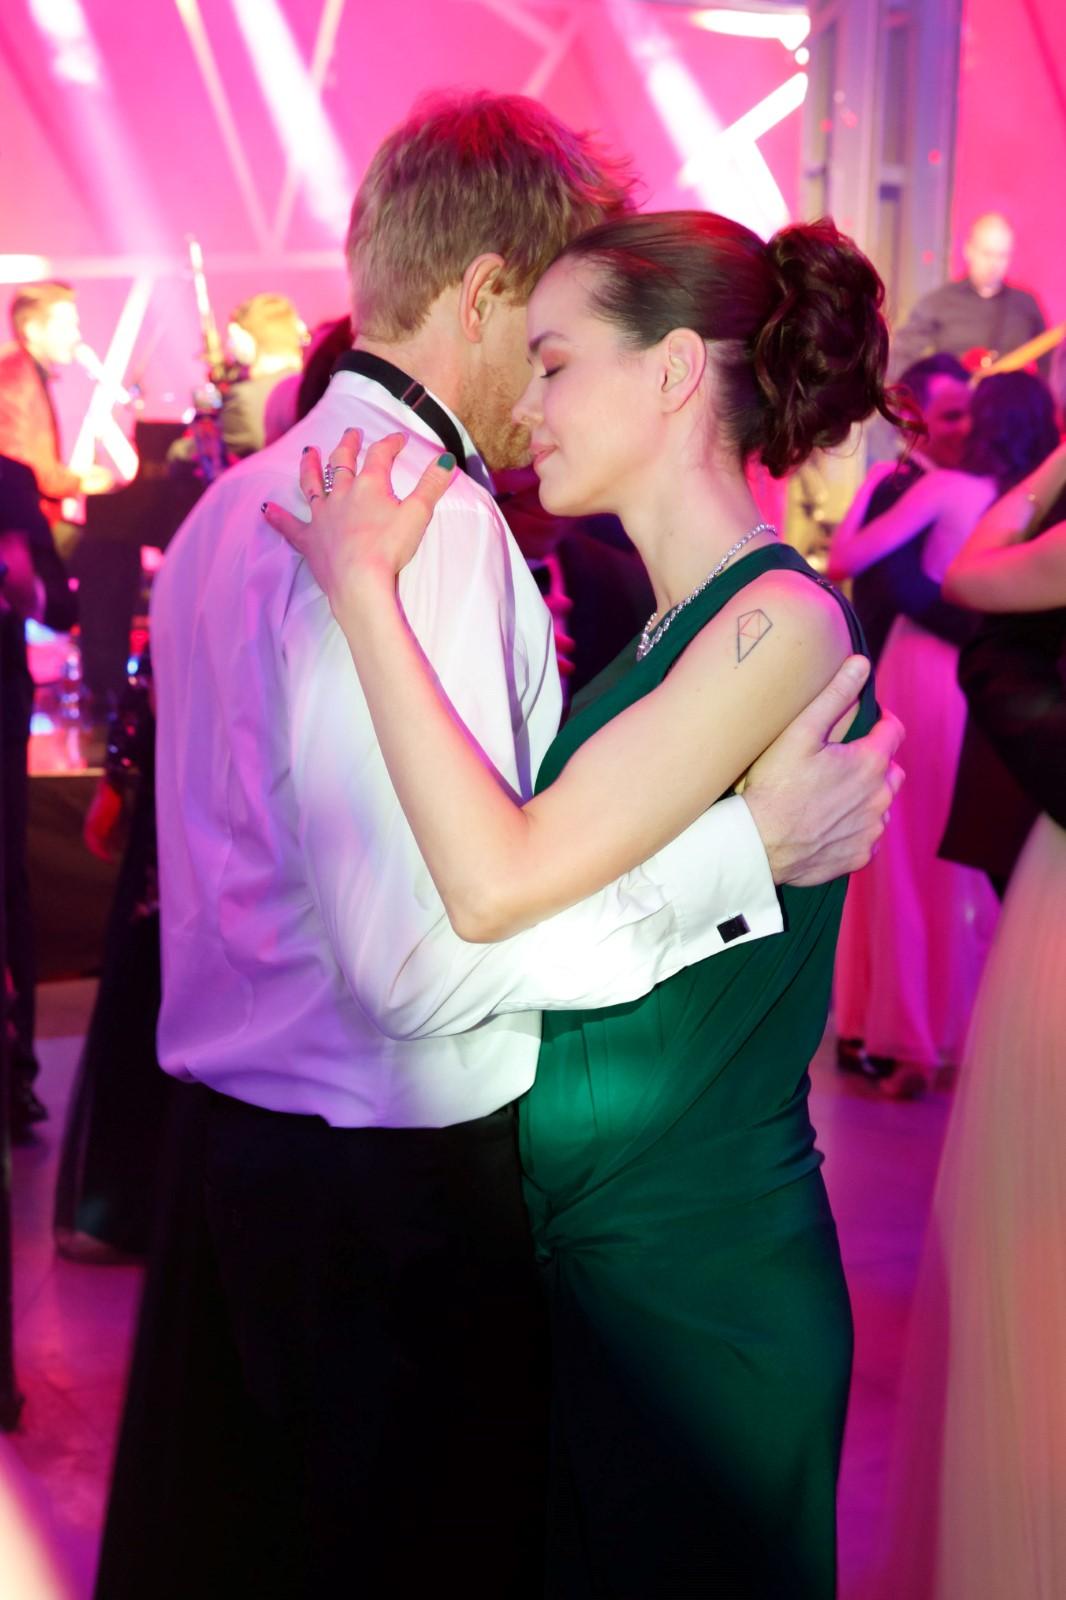 Ples jako Brno: Karel Janeček s Lilií